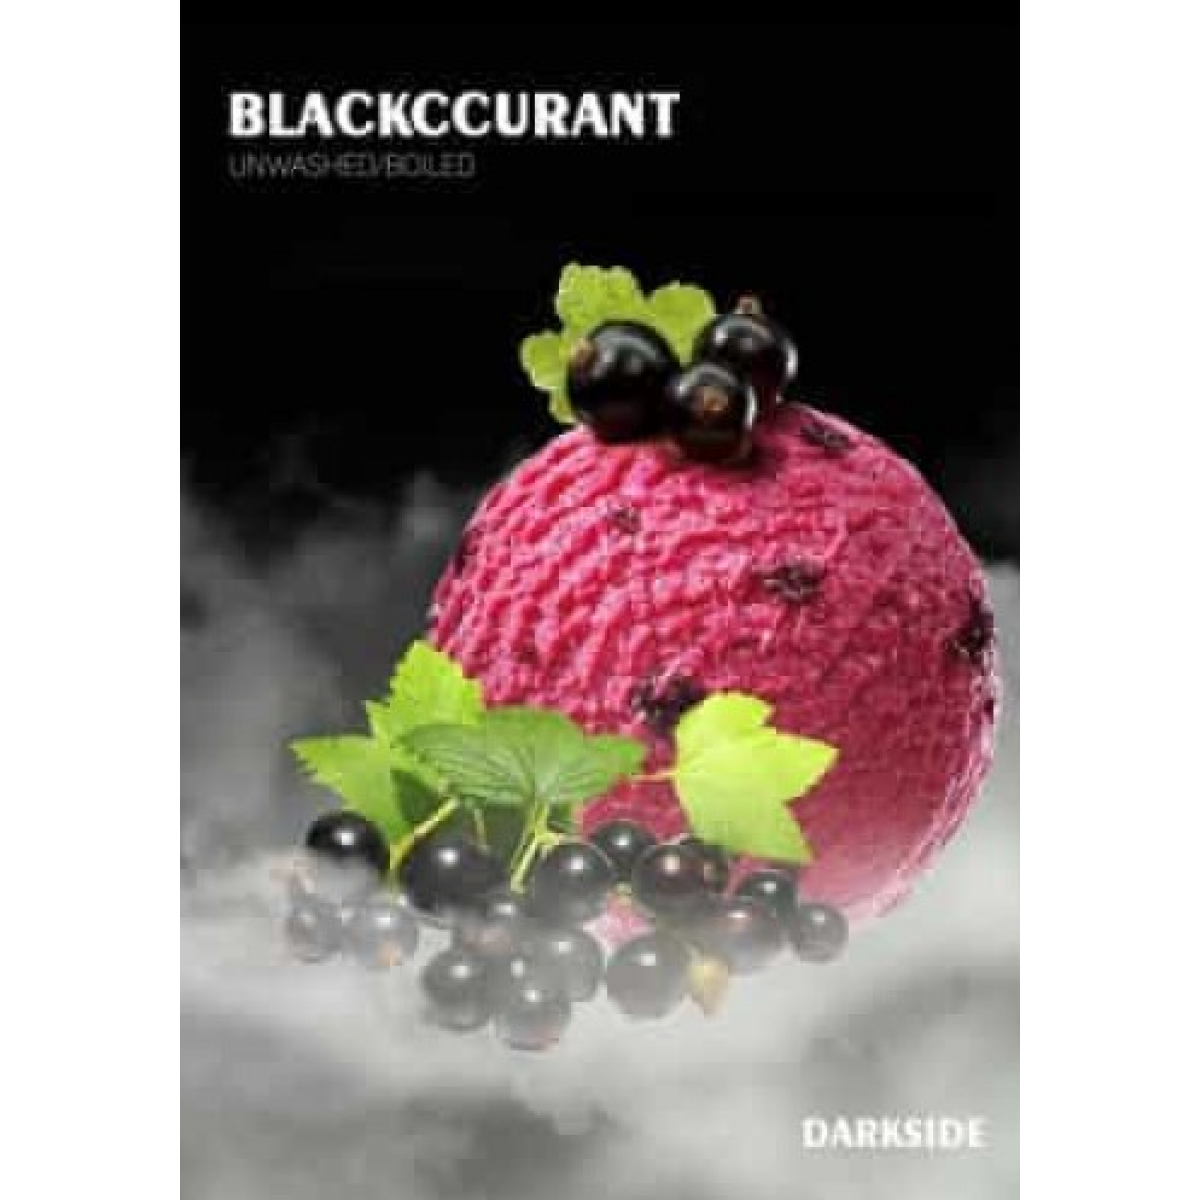 Табак Dark Side Blackccurant (Дарксайд Черная смородина) 250 грамм